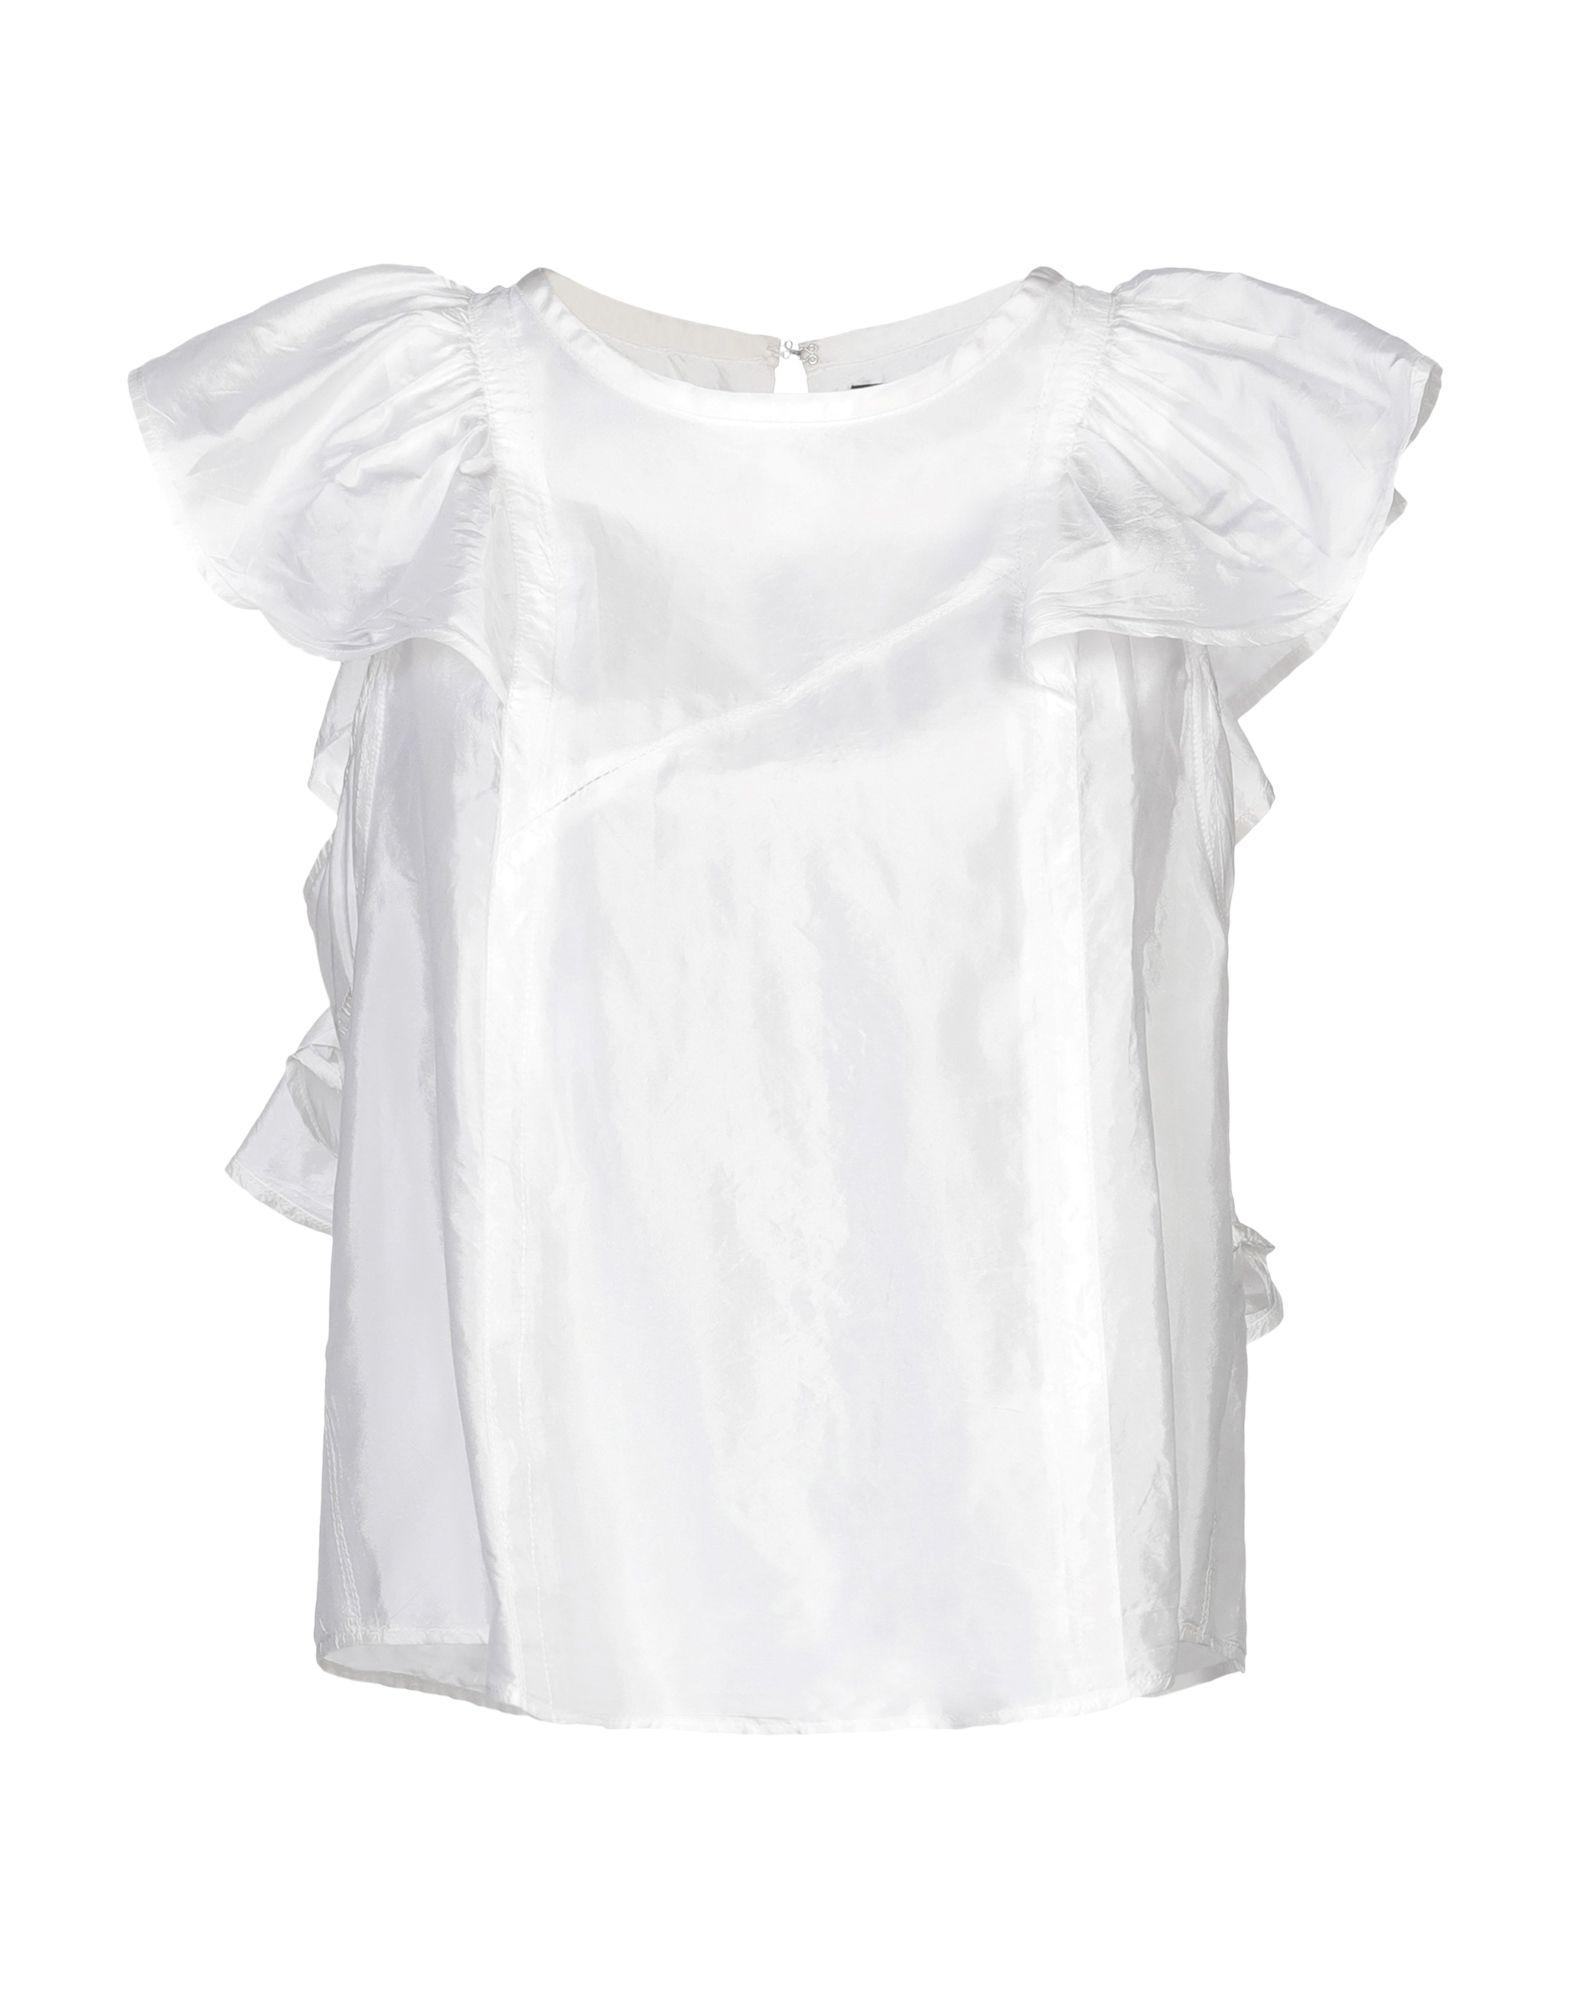 ISABEL MARANT Блузка isabel marant блузка